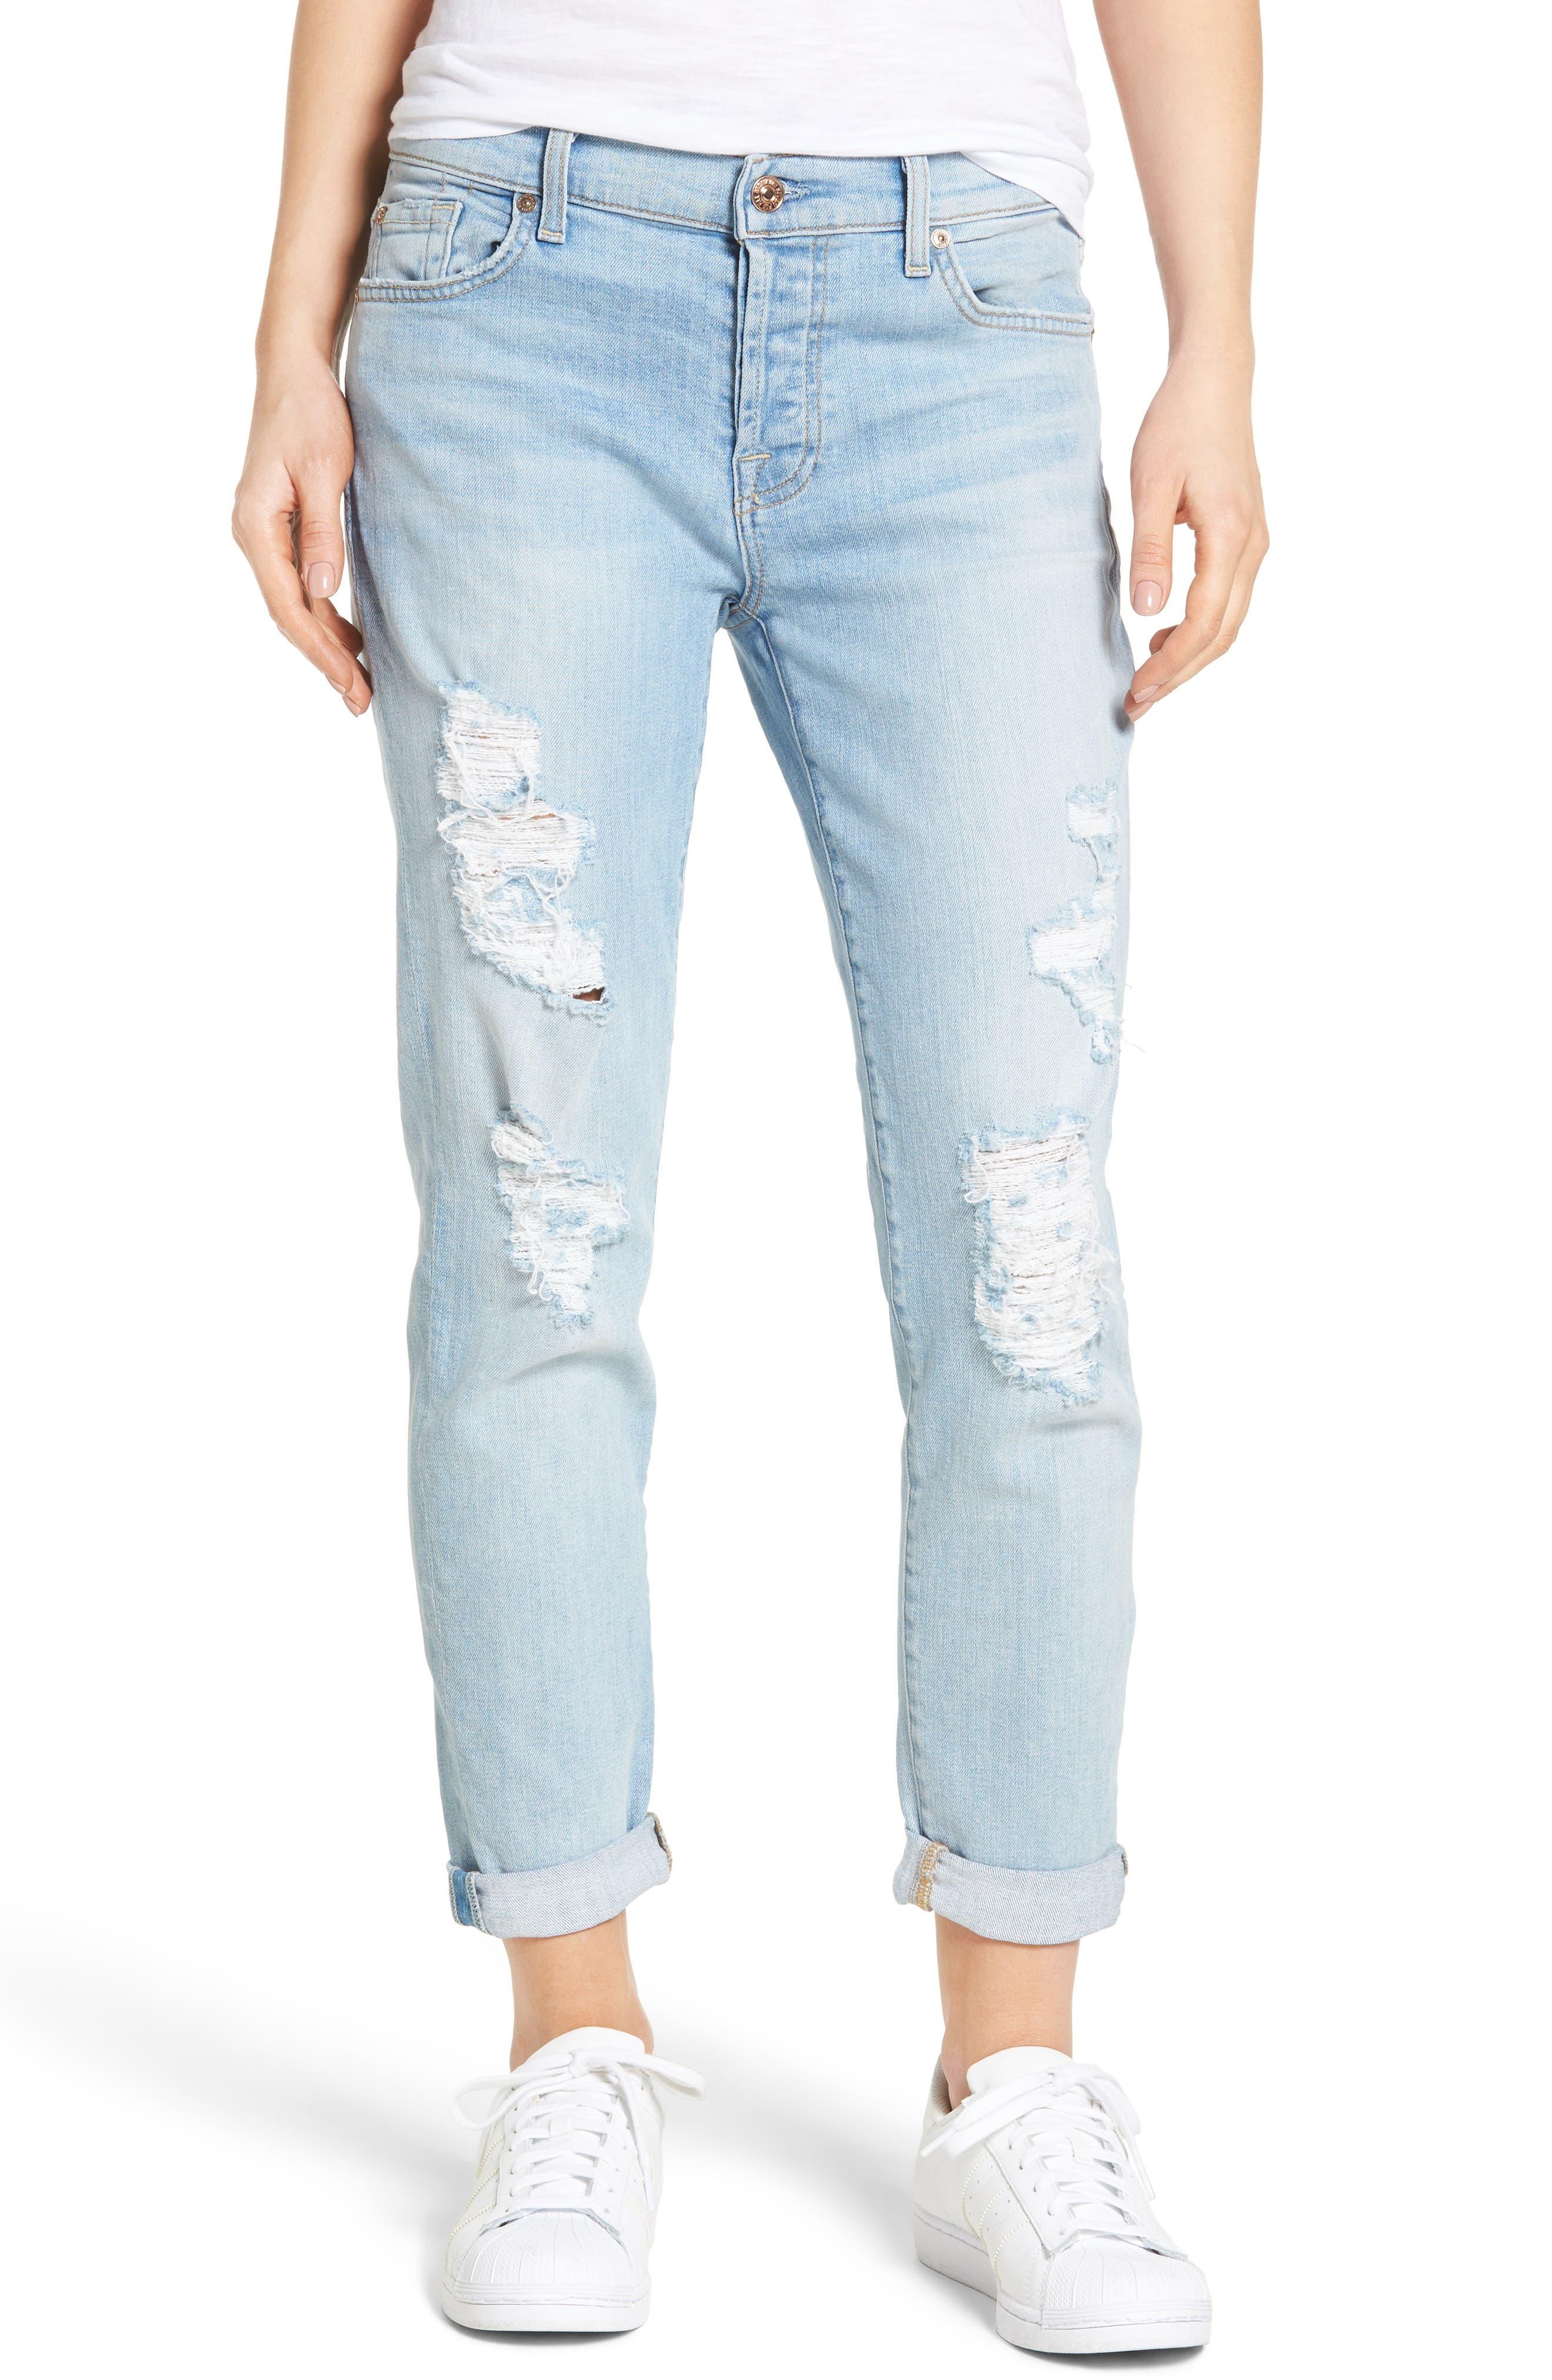 Alternate Image 1 Selected - 7 For All Mankind® 'Josefina' Boyfriend Jeans (Ocean Breeze)